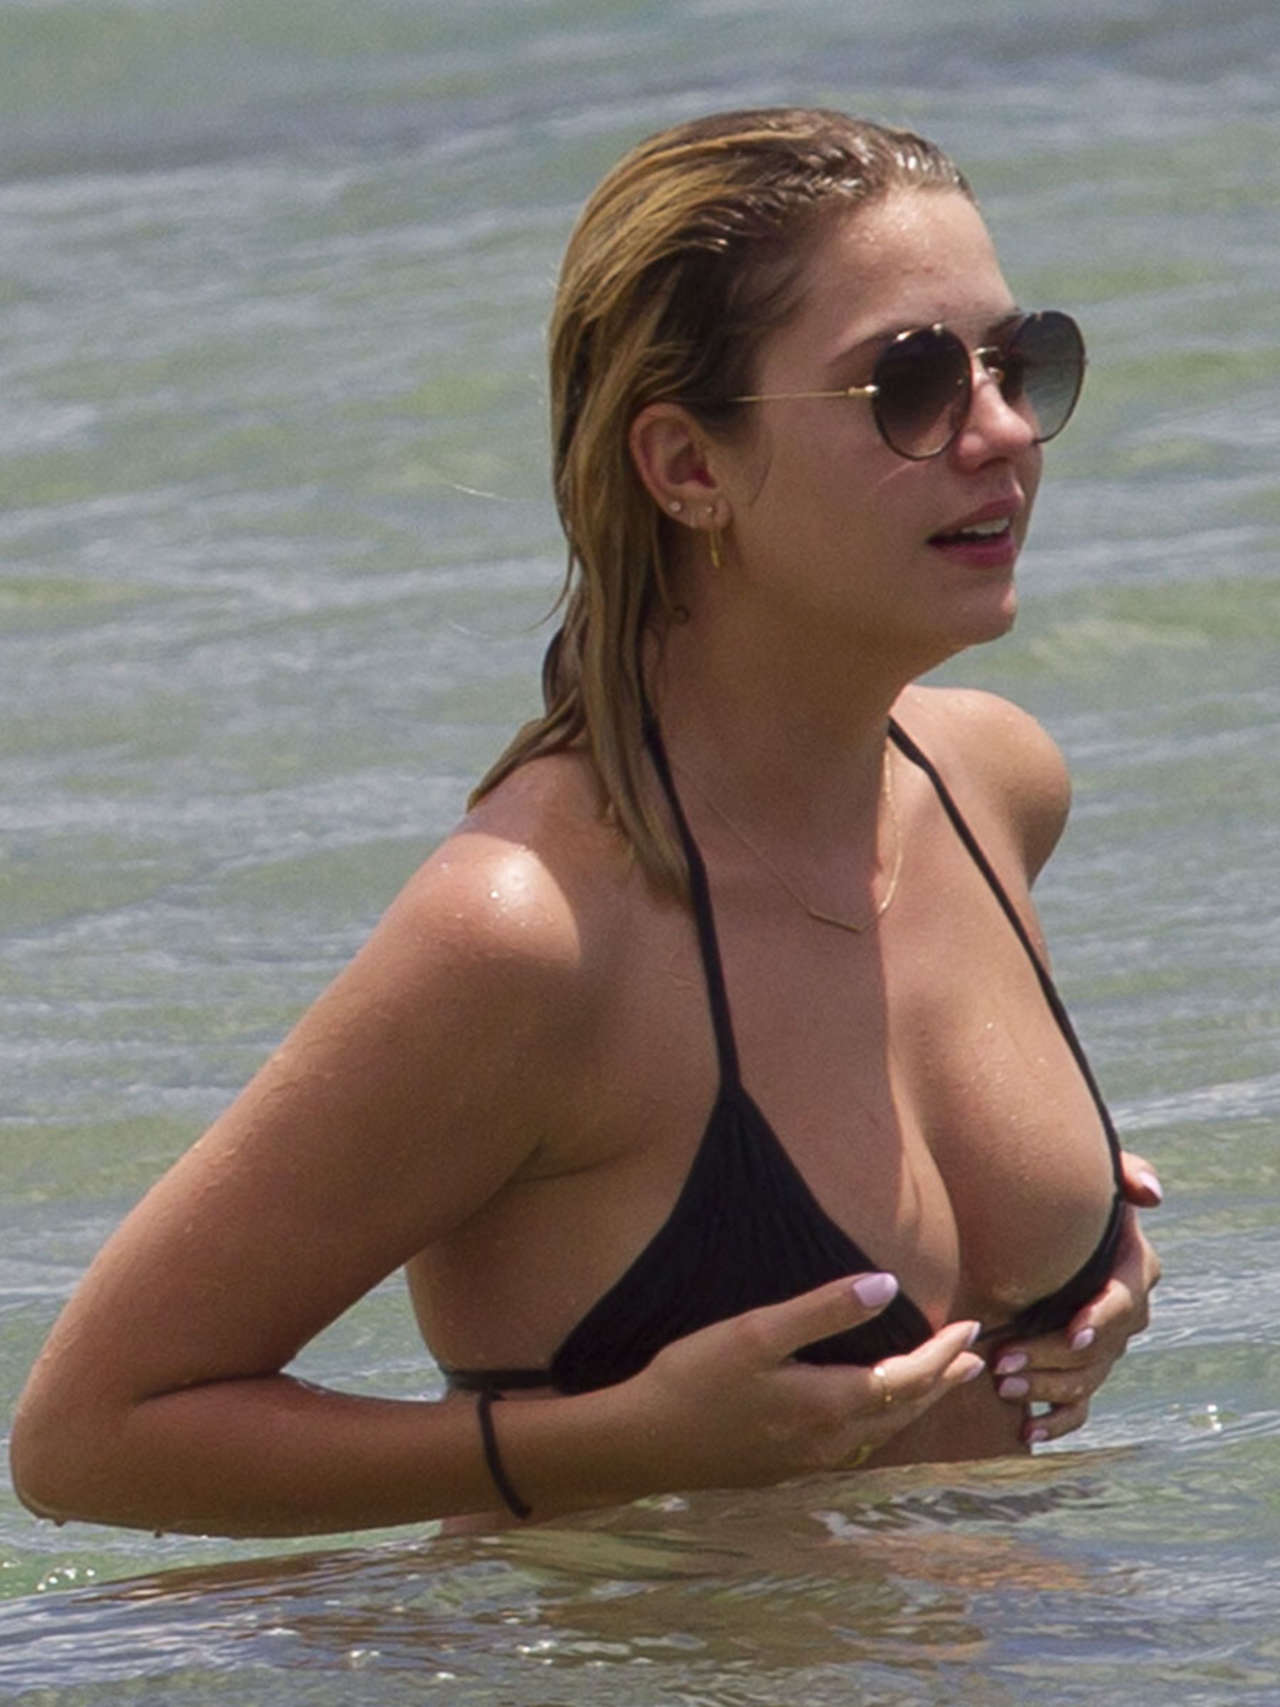 Ashley Benson Bikini Bodies Pic 6 of 35